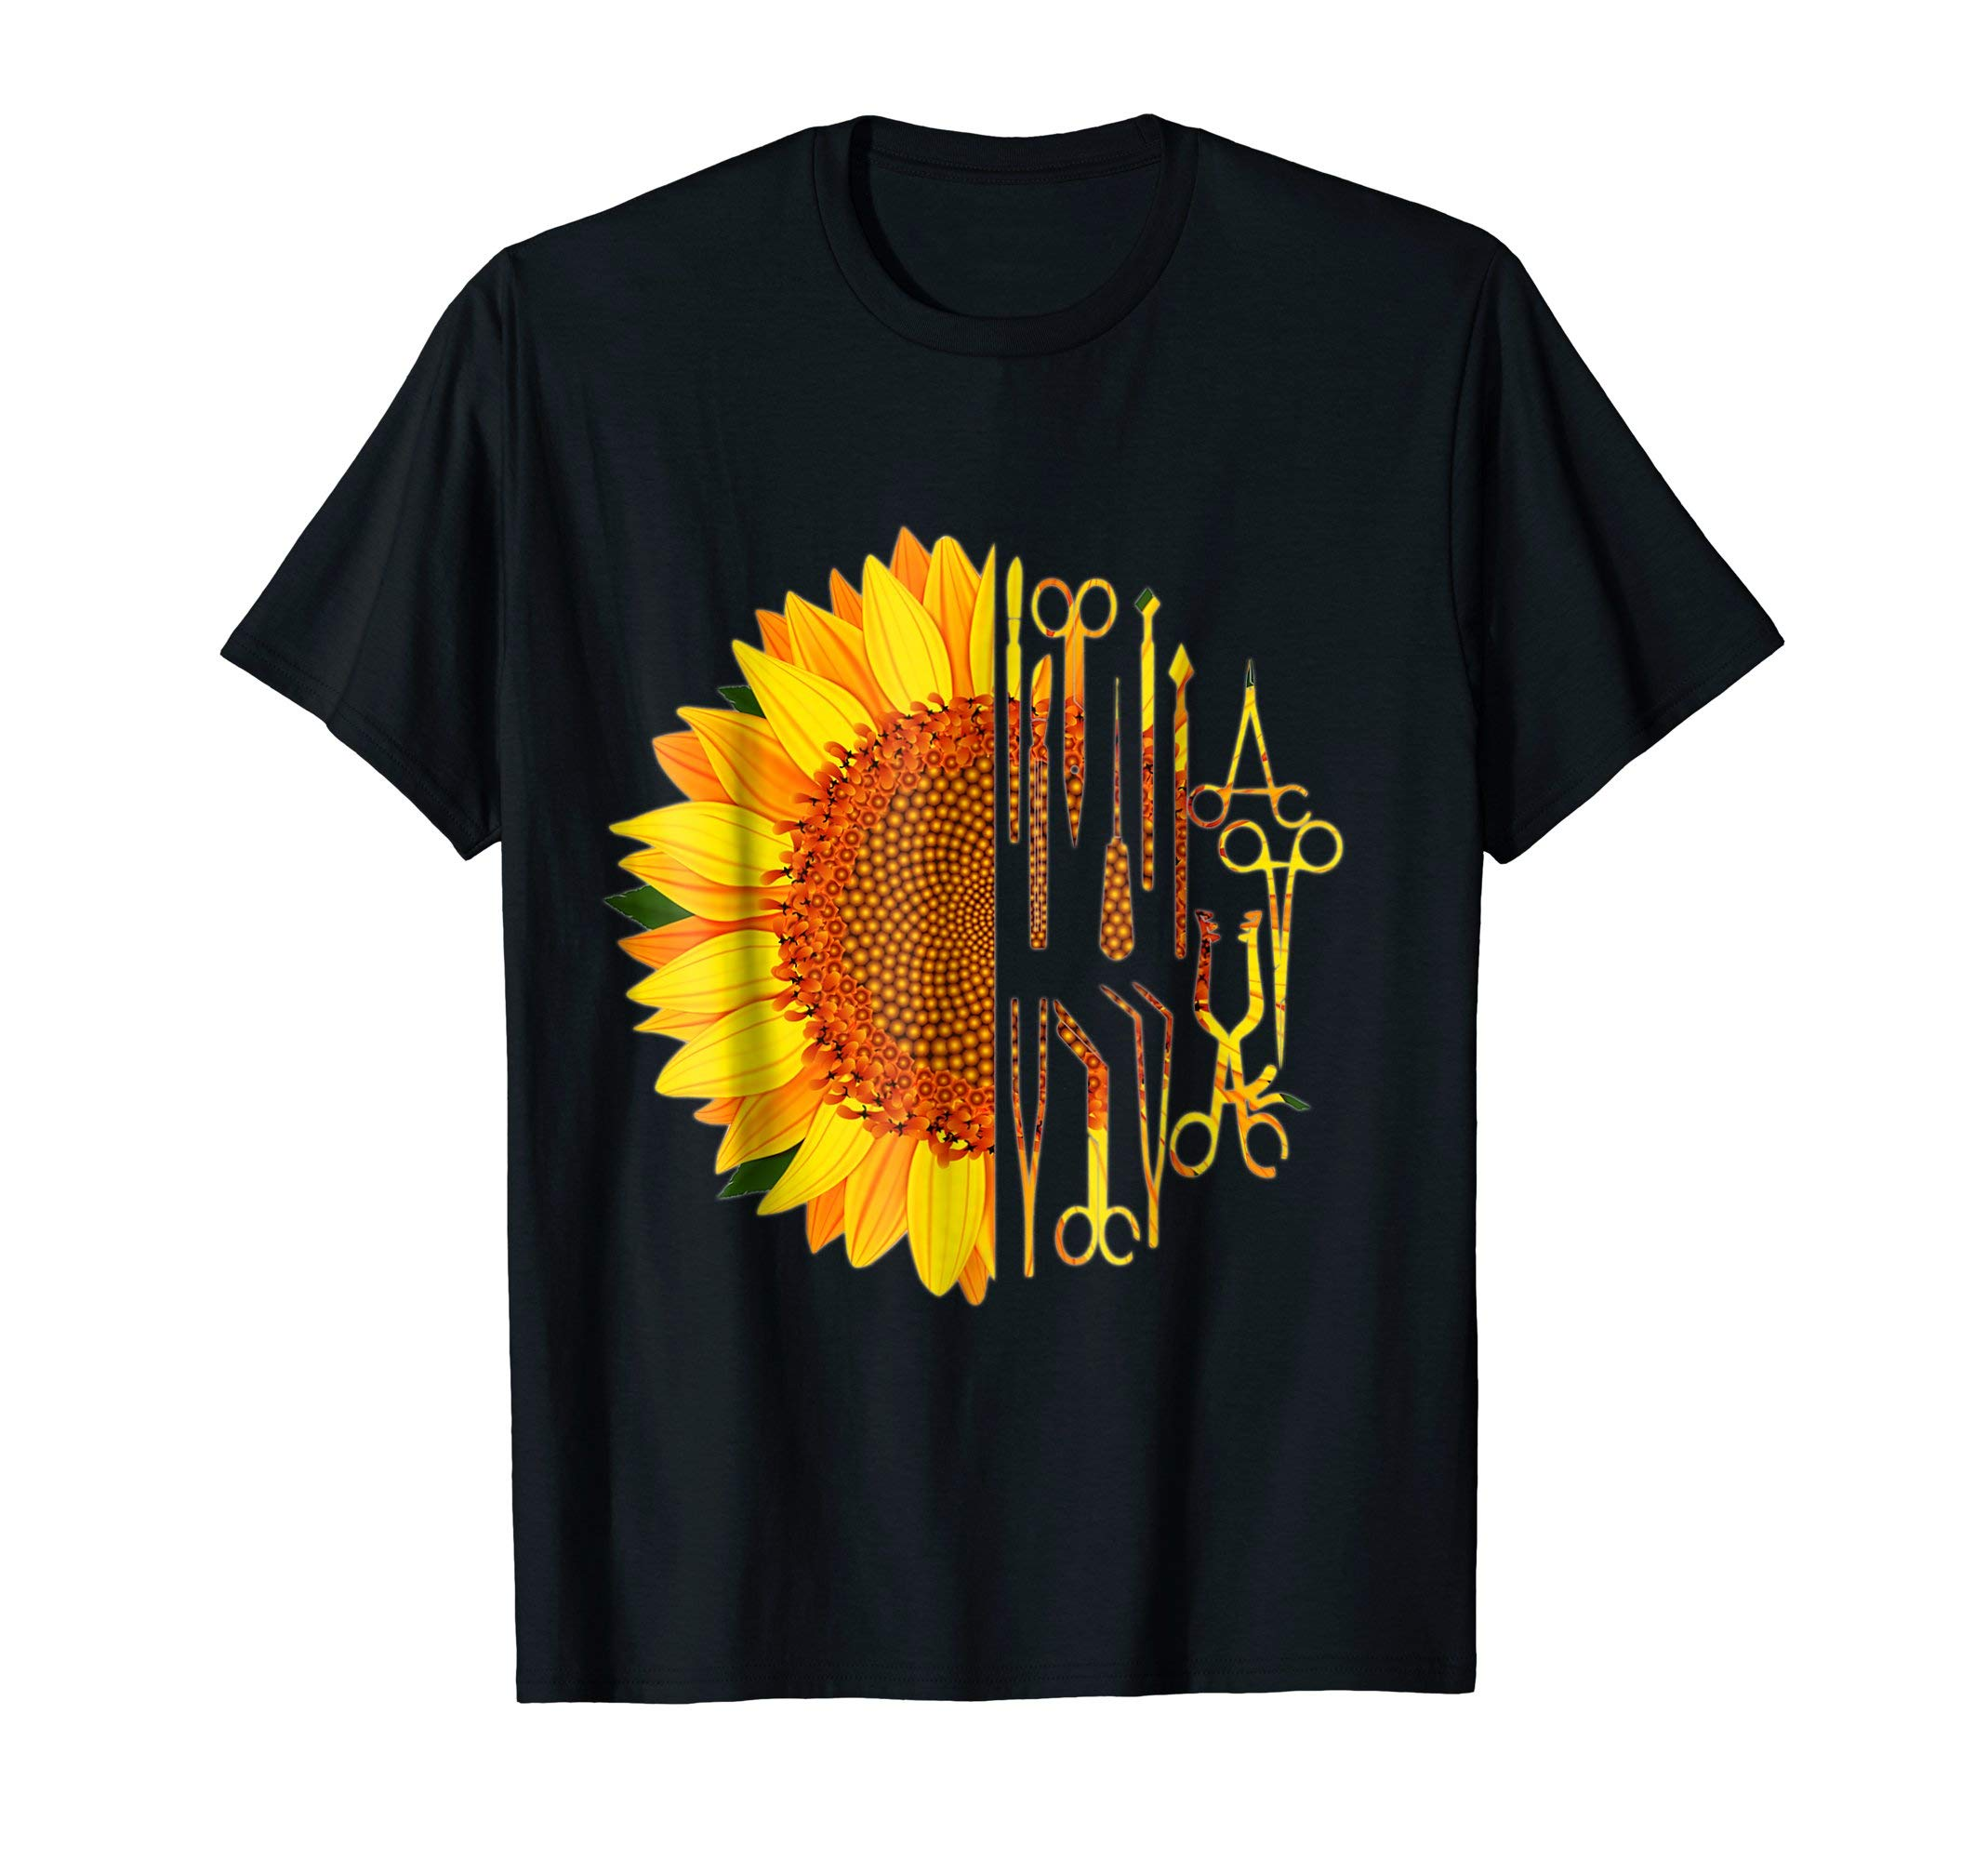 Surgical Scrub Tech Surgeon T-Shirt Sunflower Surgery Intern by Scrub Tech Smitten by Kristin